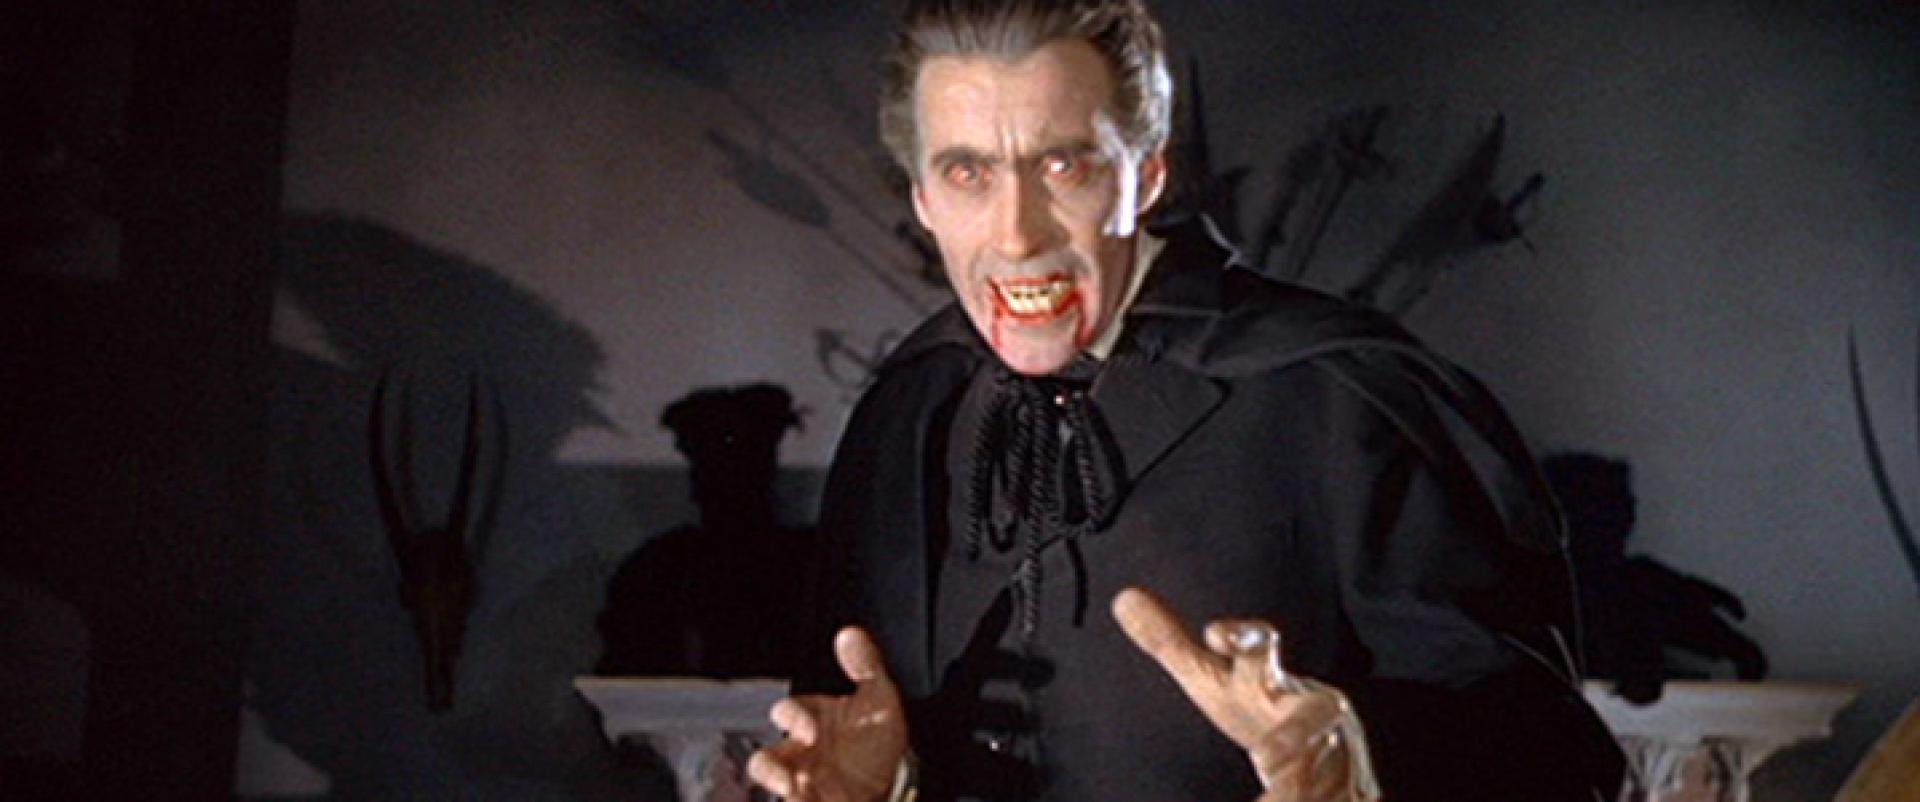 Drakula (1958)